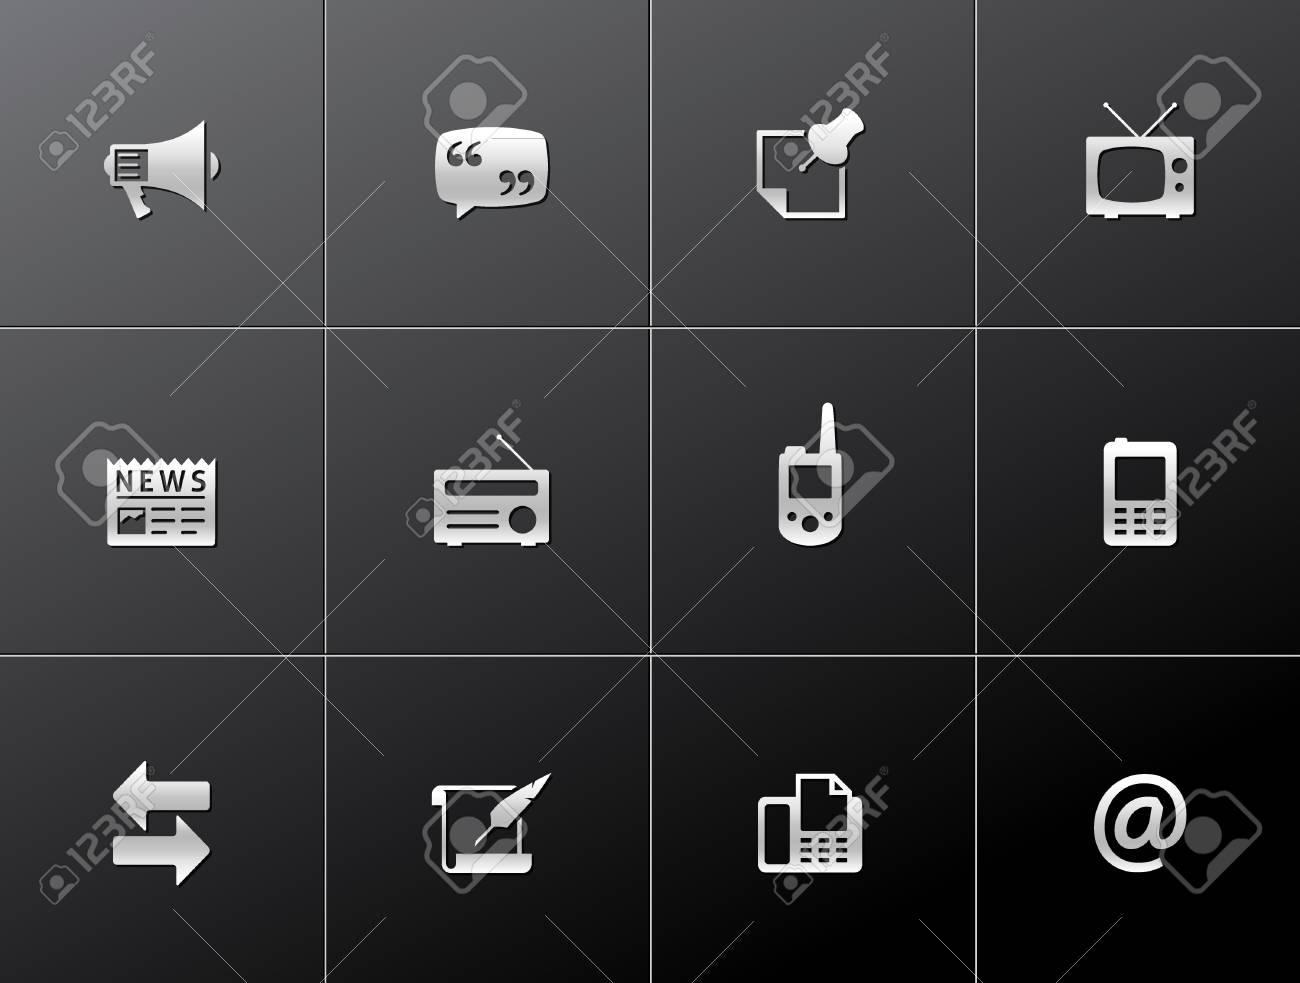 Communication icon series in metallic style Stock Vector - 15259224